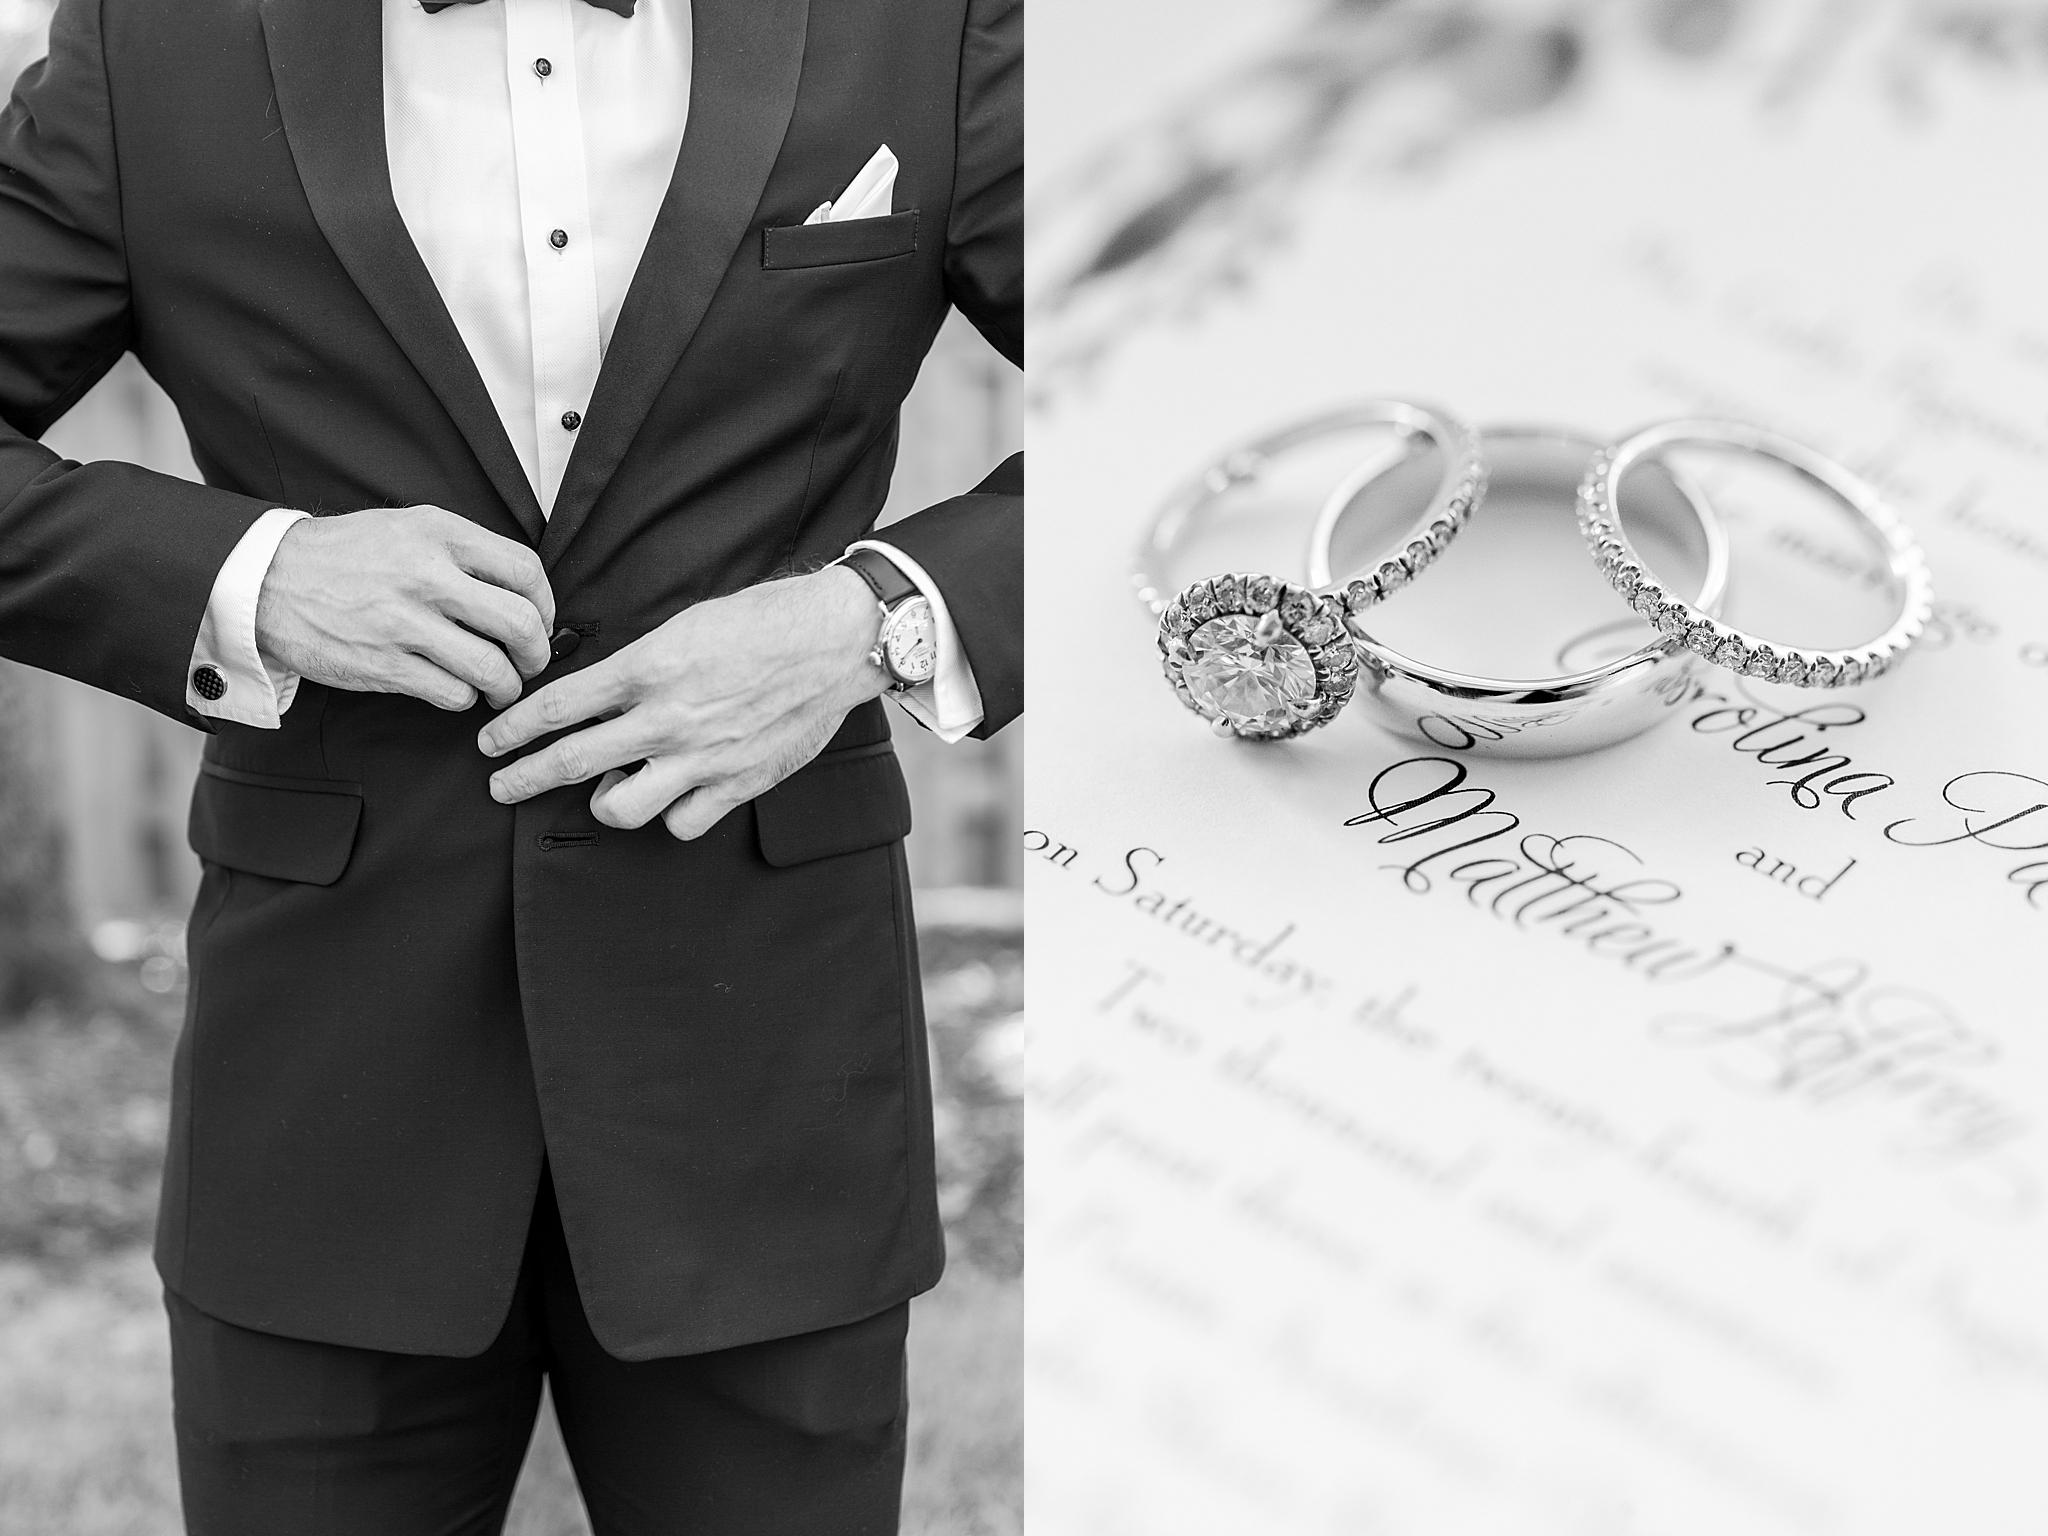 detroit-wedding-photographer-grosse-pointe-academy-chapel-detroit-golf-club-wedding-carly-matt-by-courtney-carolyn-photography_0002.jpg